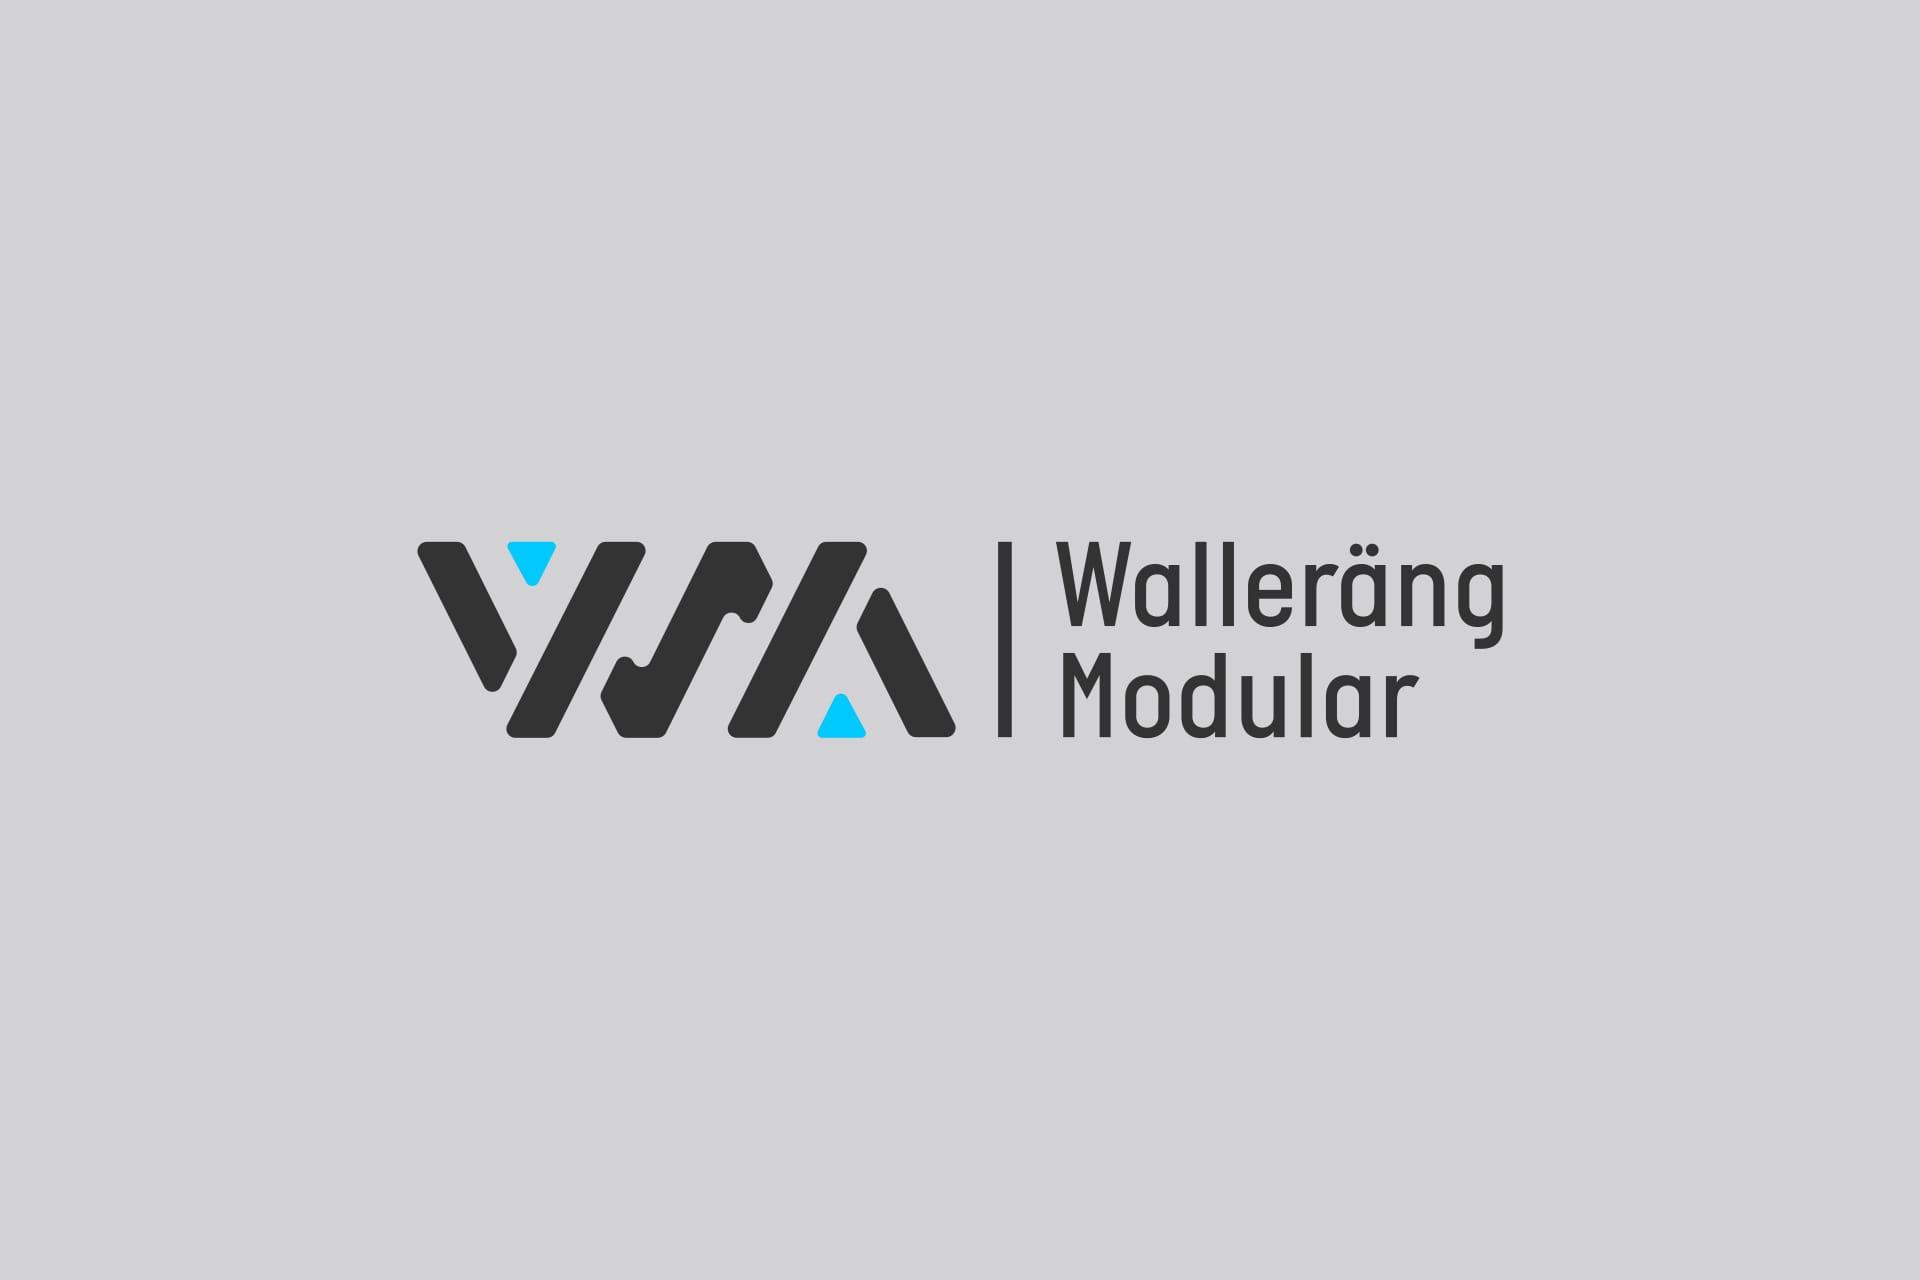 Wallerang_Modular_Identity_mnecander-1